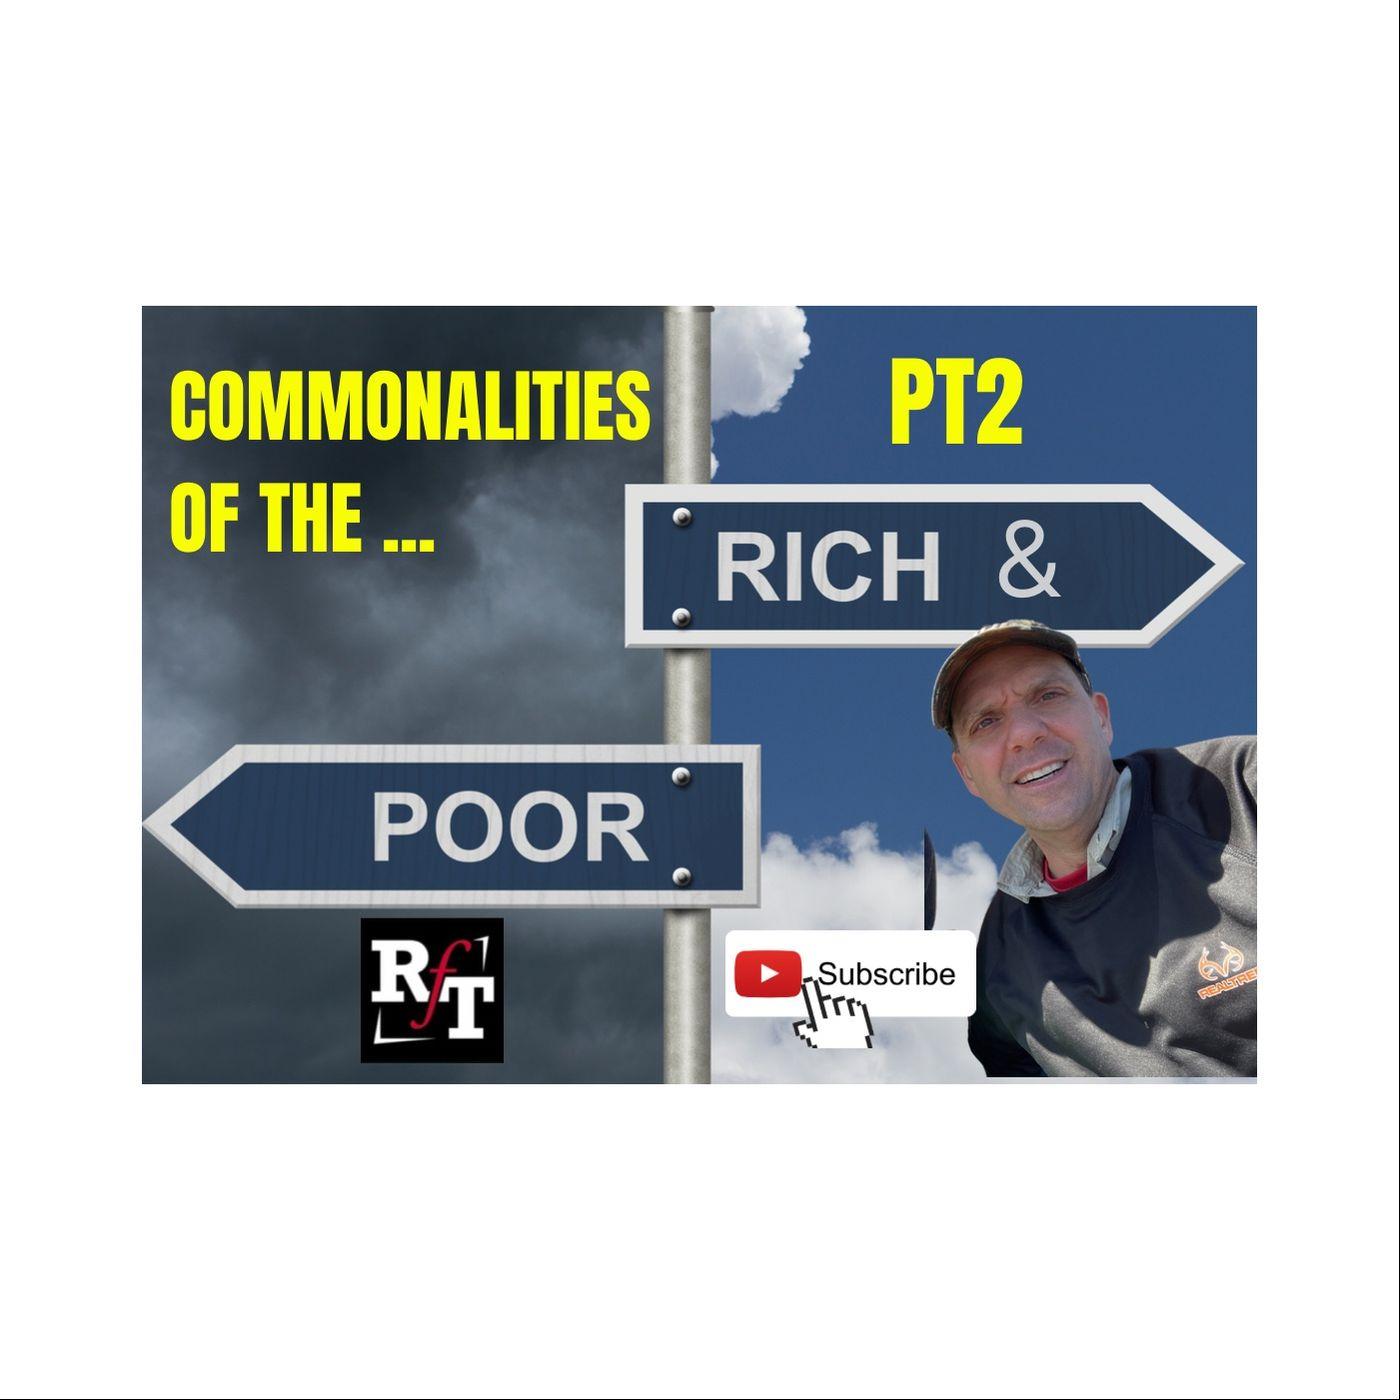 PT2-Commonalities of Rich & Poor - 3:24:21, 9.36 PM